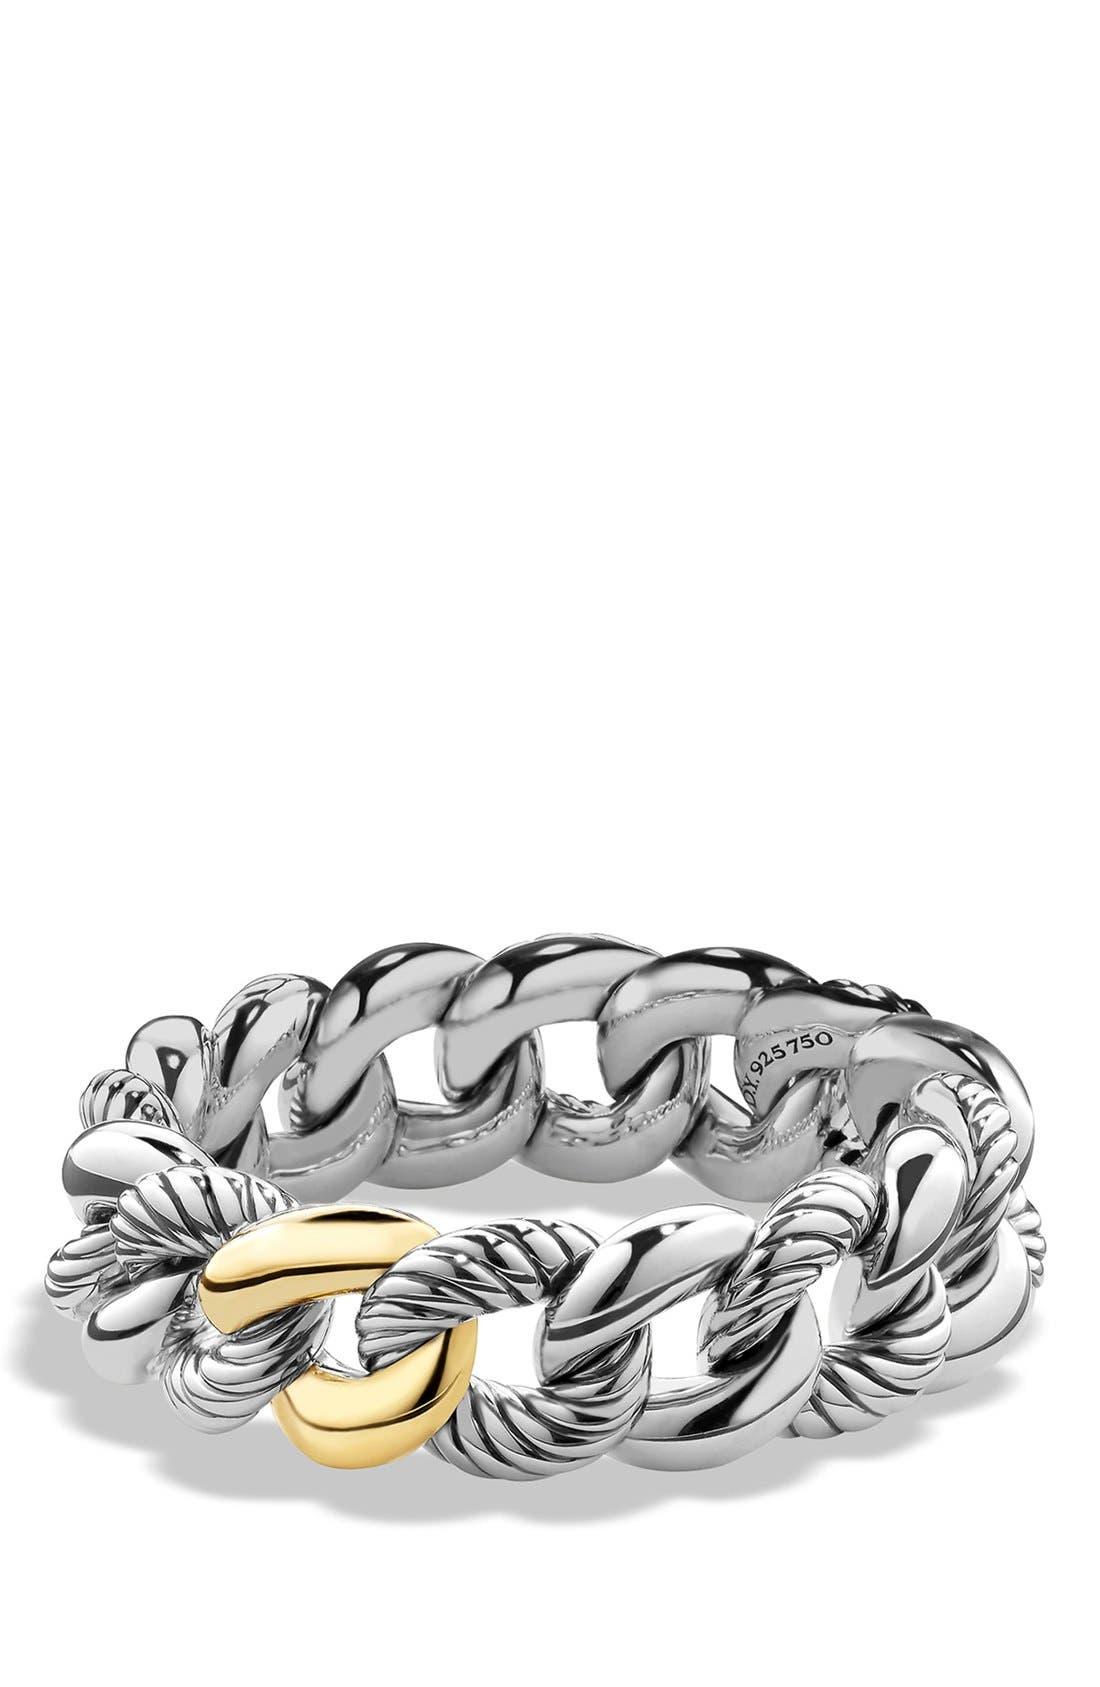 DAVID YURMAN 'Belmont' Curb Link Bracelet with 18K